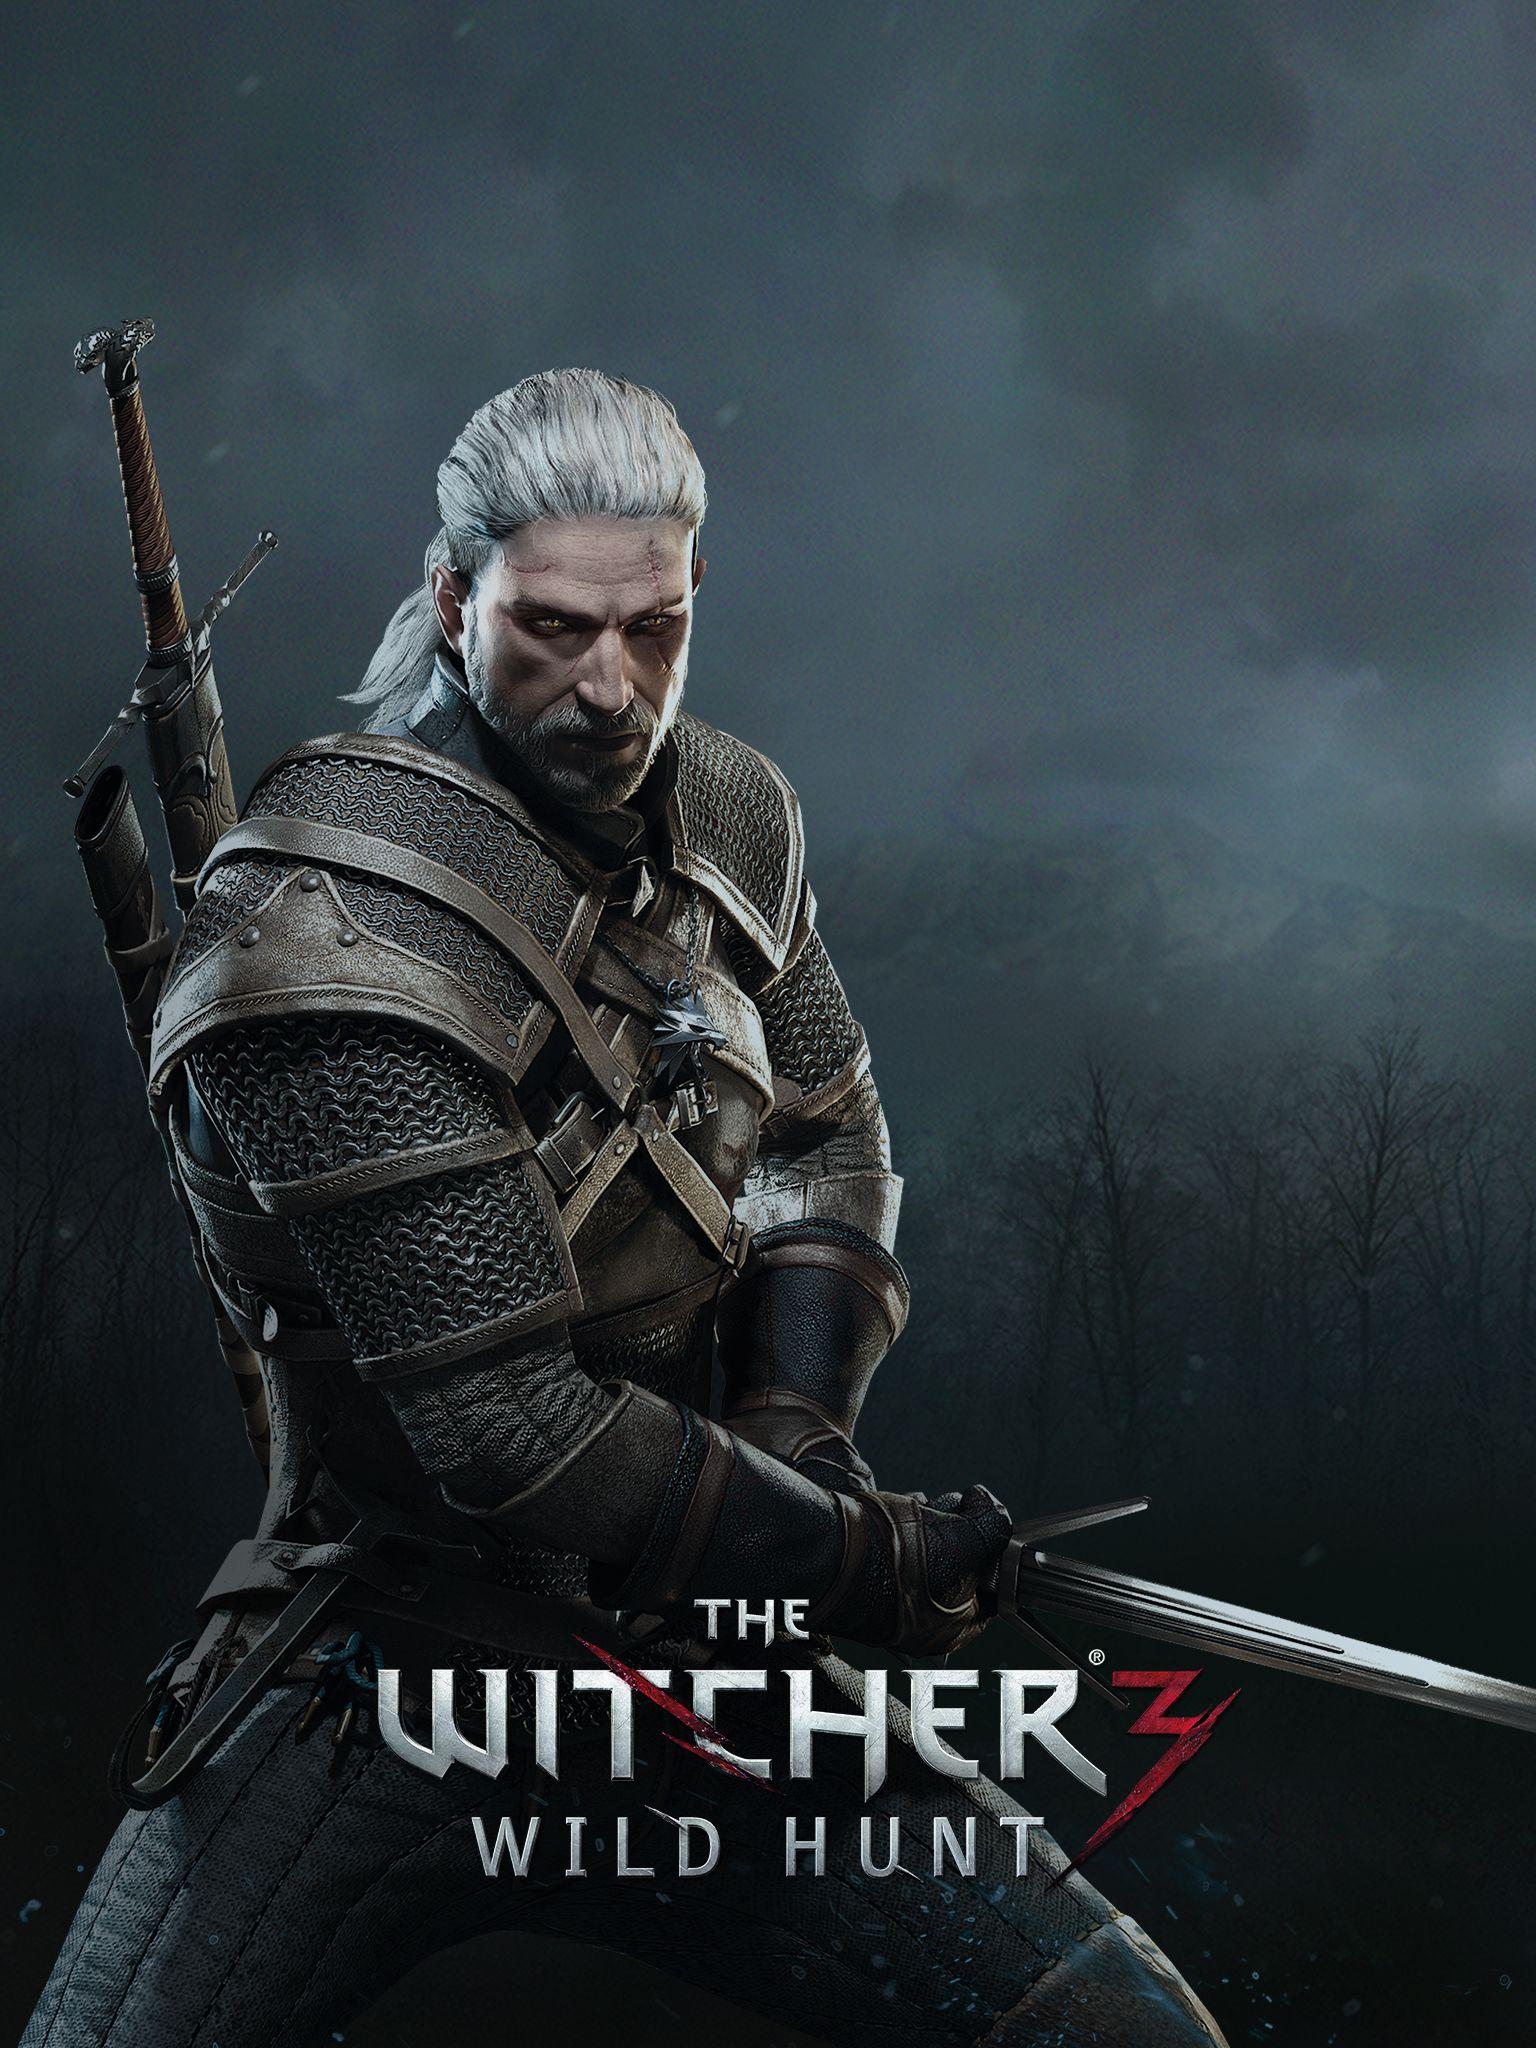 Geralt Of Rivia The Witcher 3 Wild Hunt Oyunlar Oyun